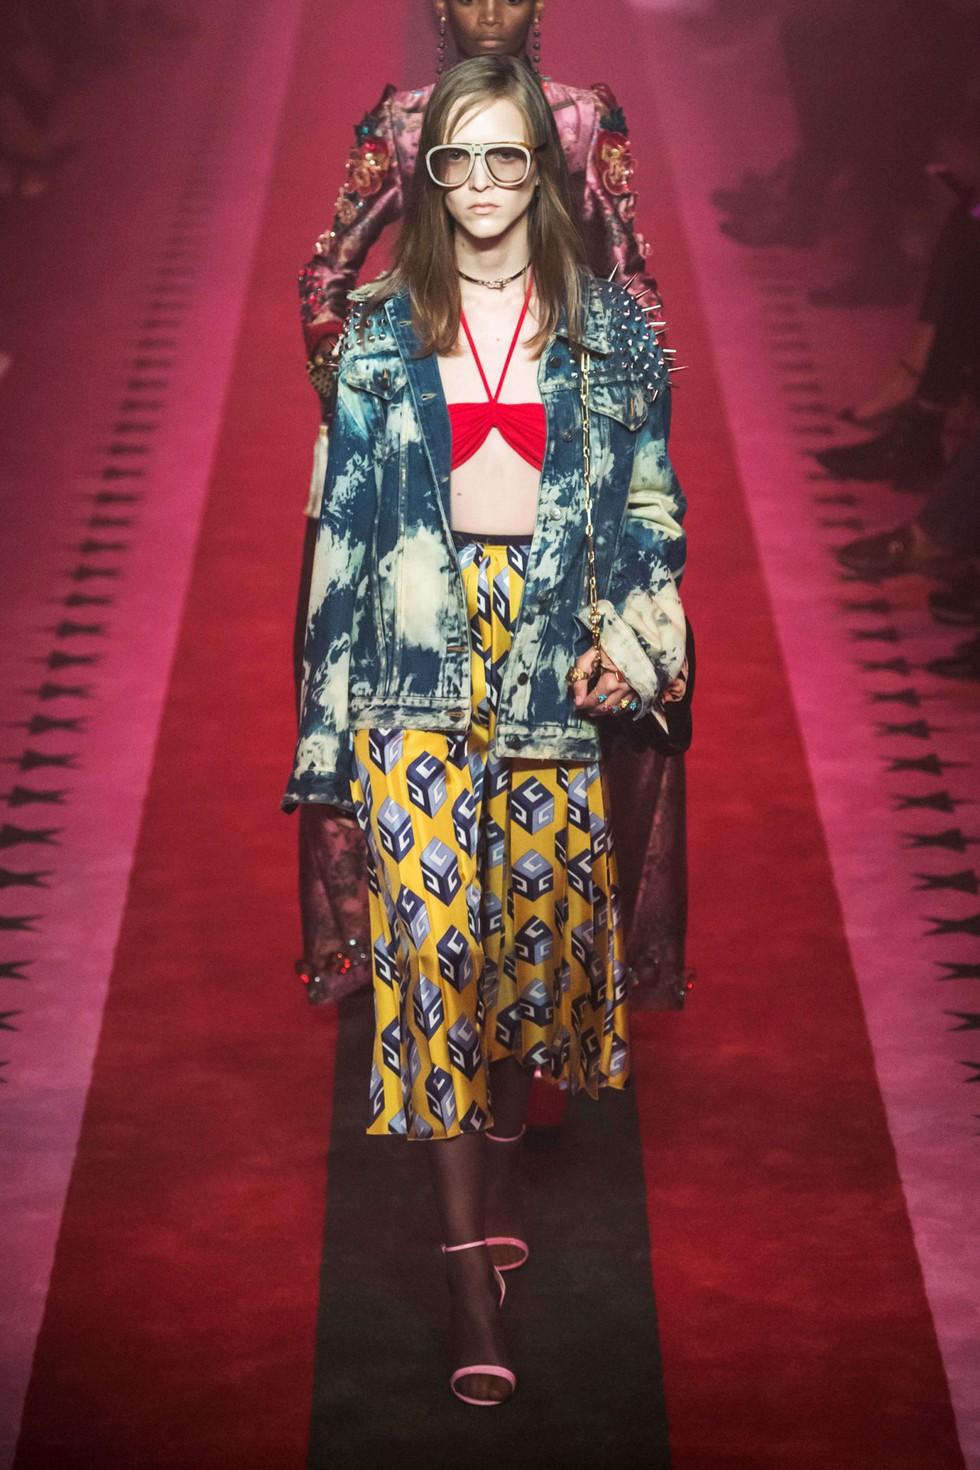 Gucci italian luxury fashion brand Milan Design Week 2016